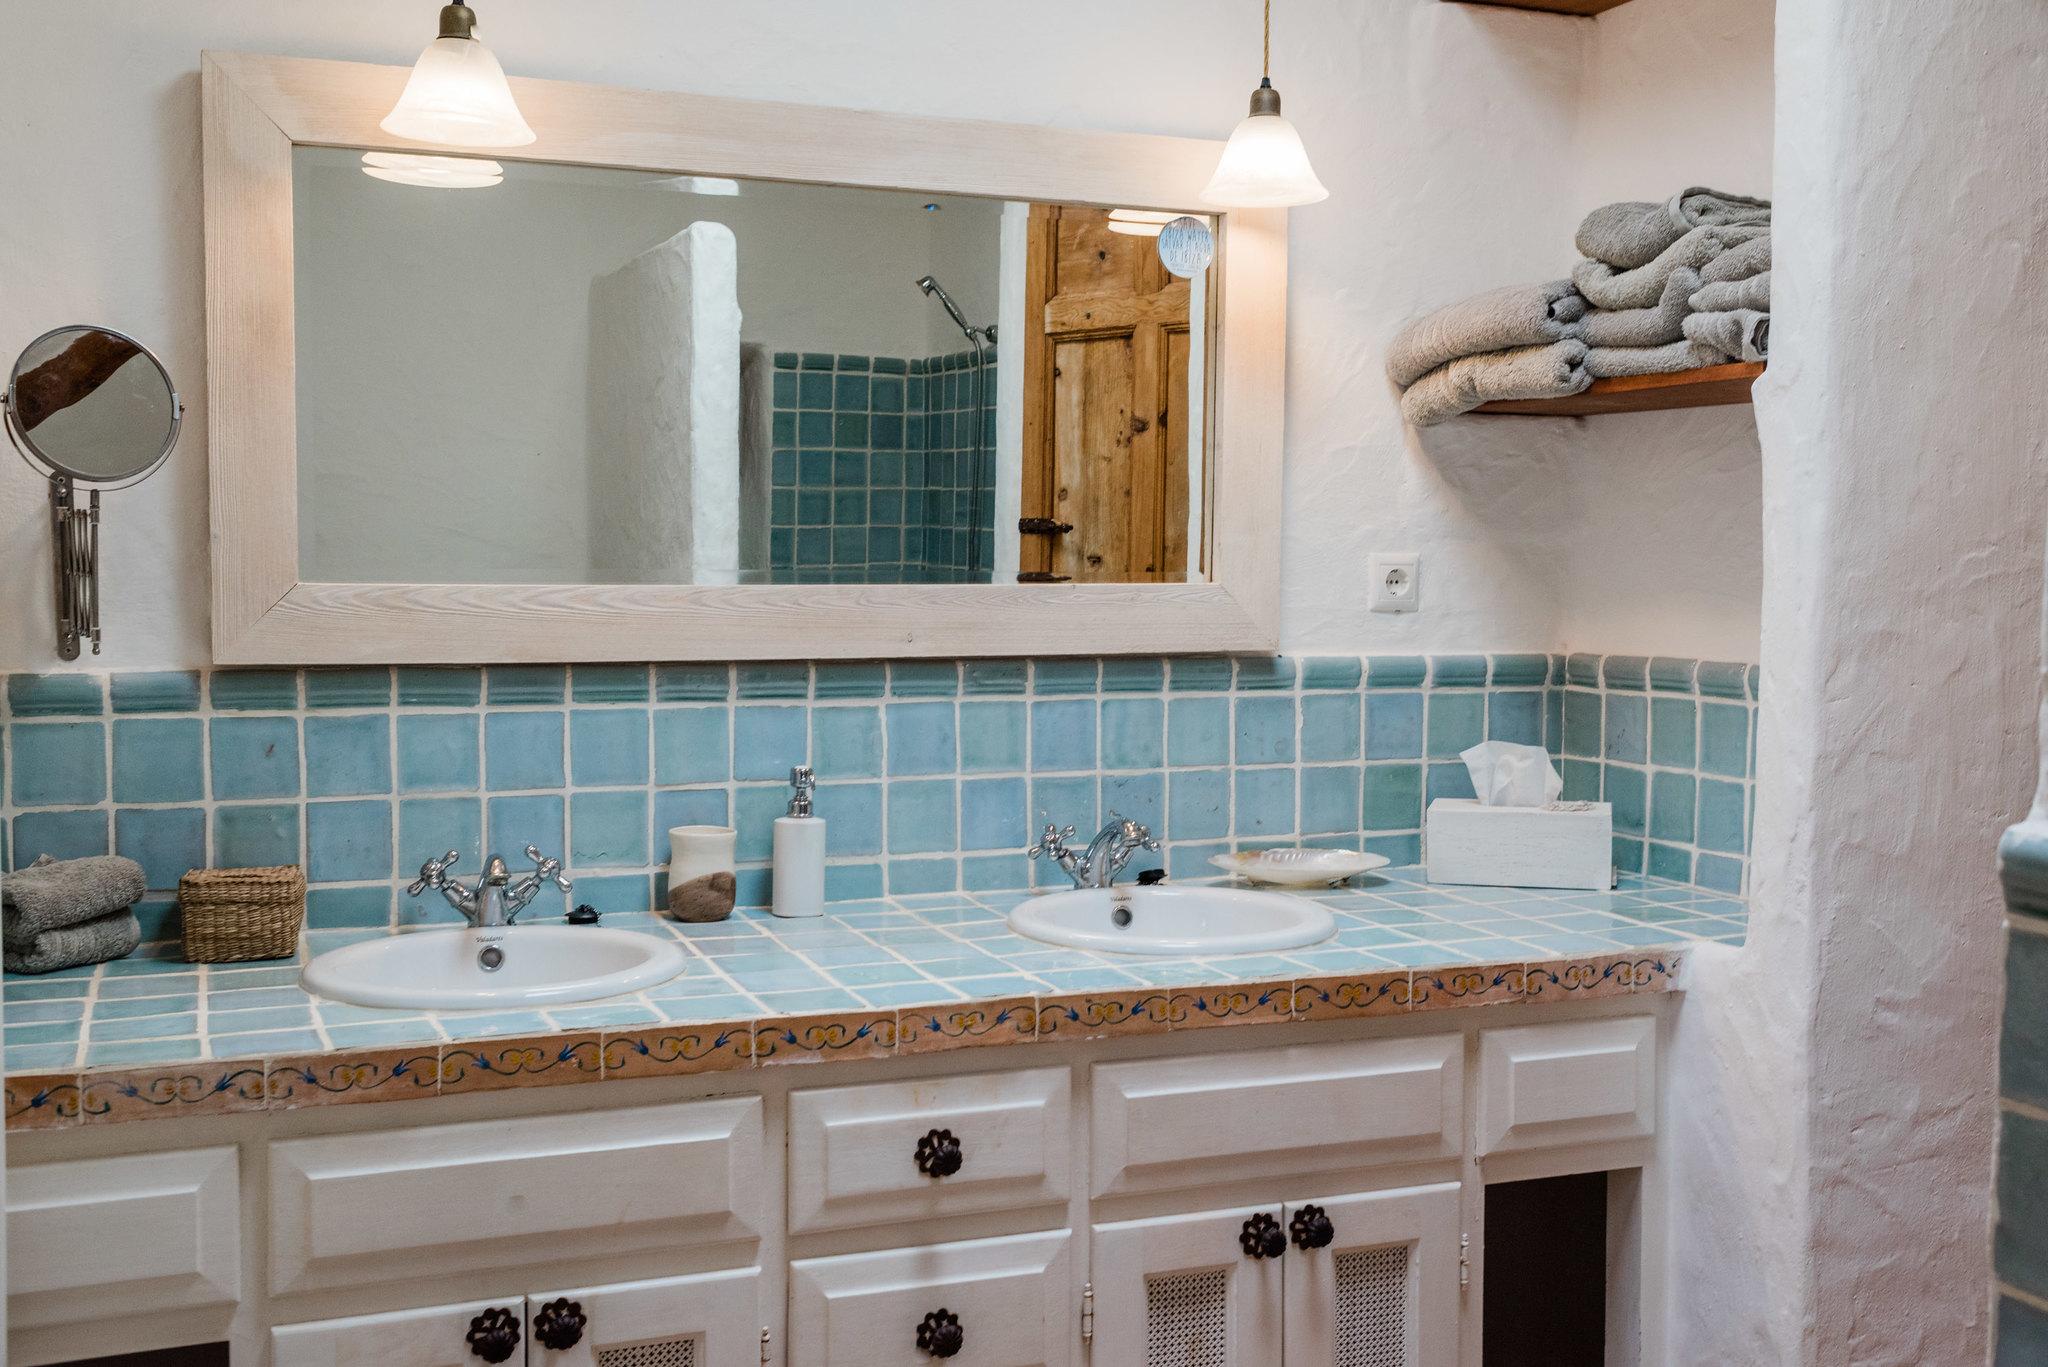 https://www.white-ibiza.com/wp-content/uploads/2020/05/white-ibiza-villas-can-sabina-interior-bathroom.jpg